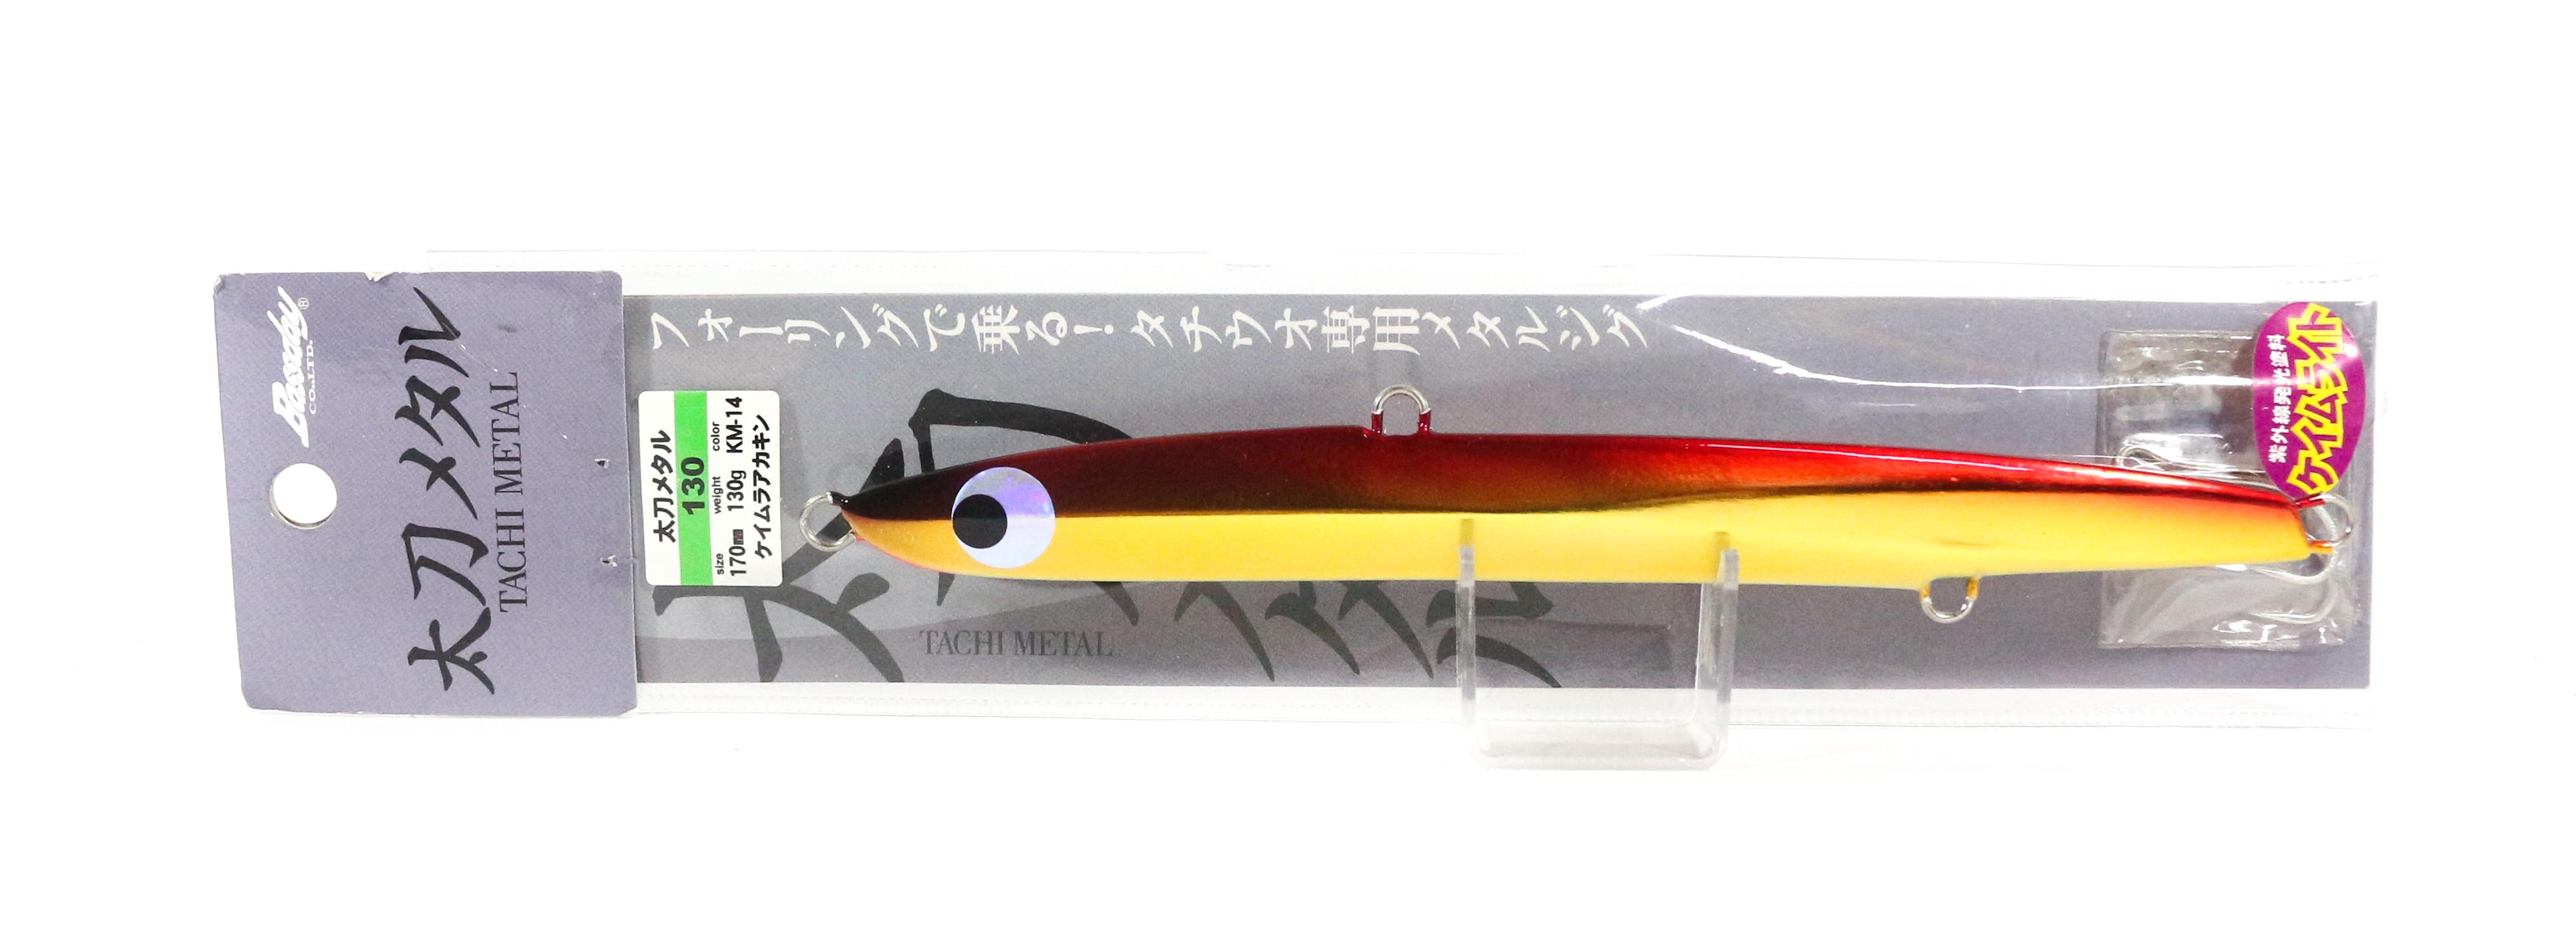 Sale Bassday Metal Jig Tachi Metal 130 grams KM-14 (4113)